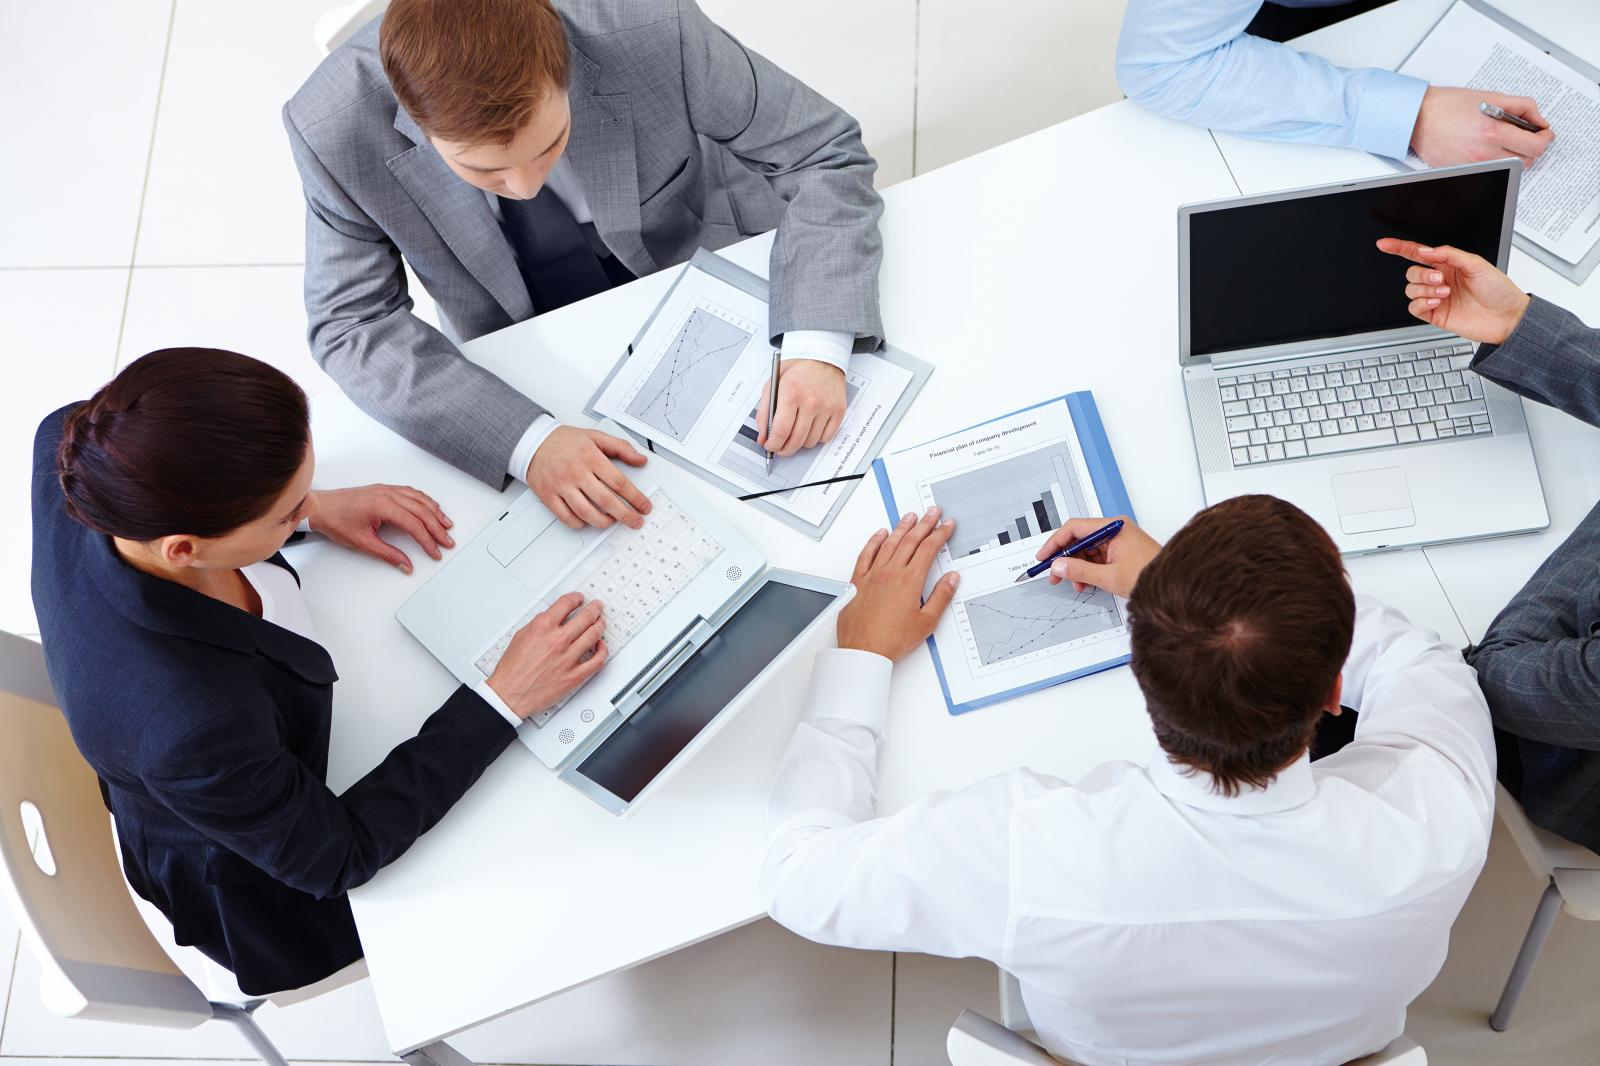 REBI SLU: Investigación, desarrollo e innovación